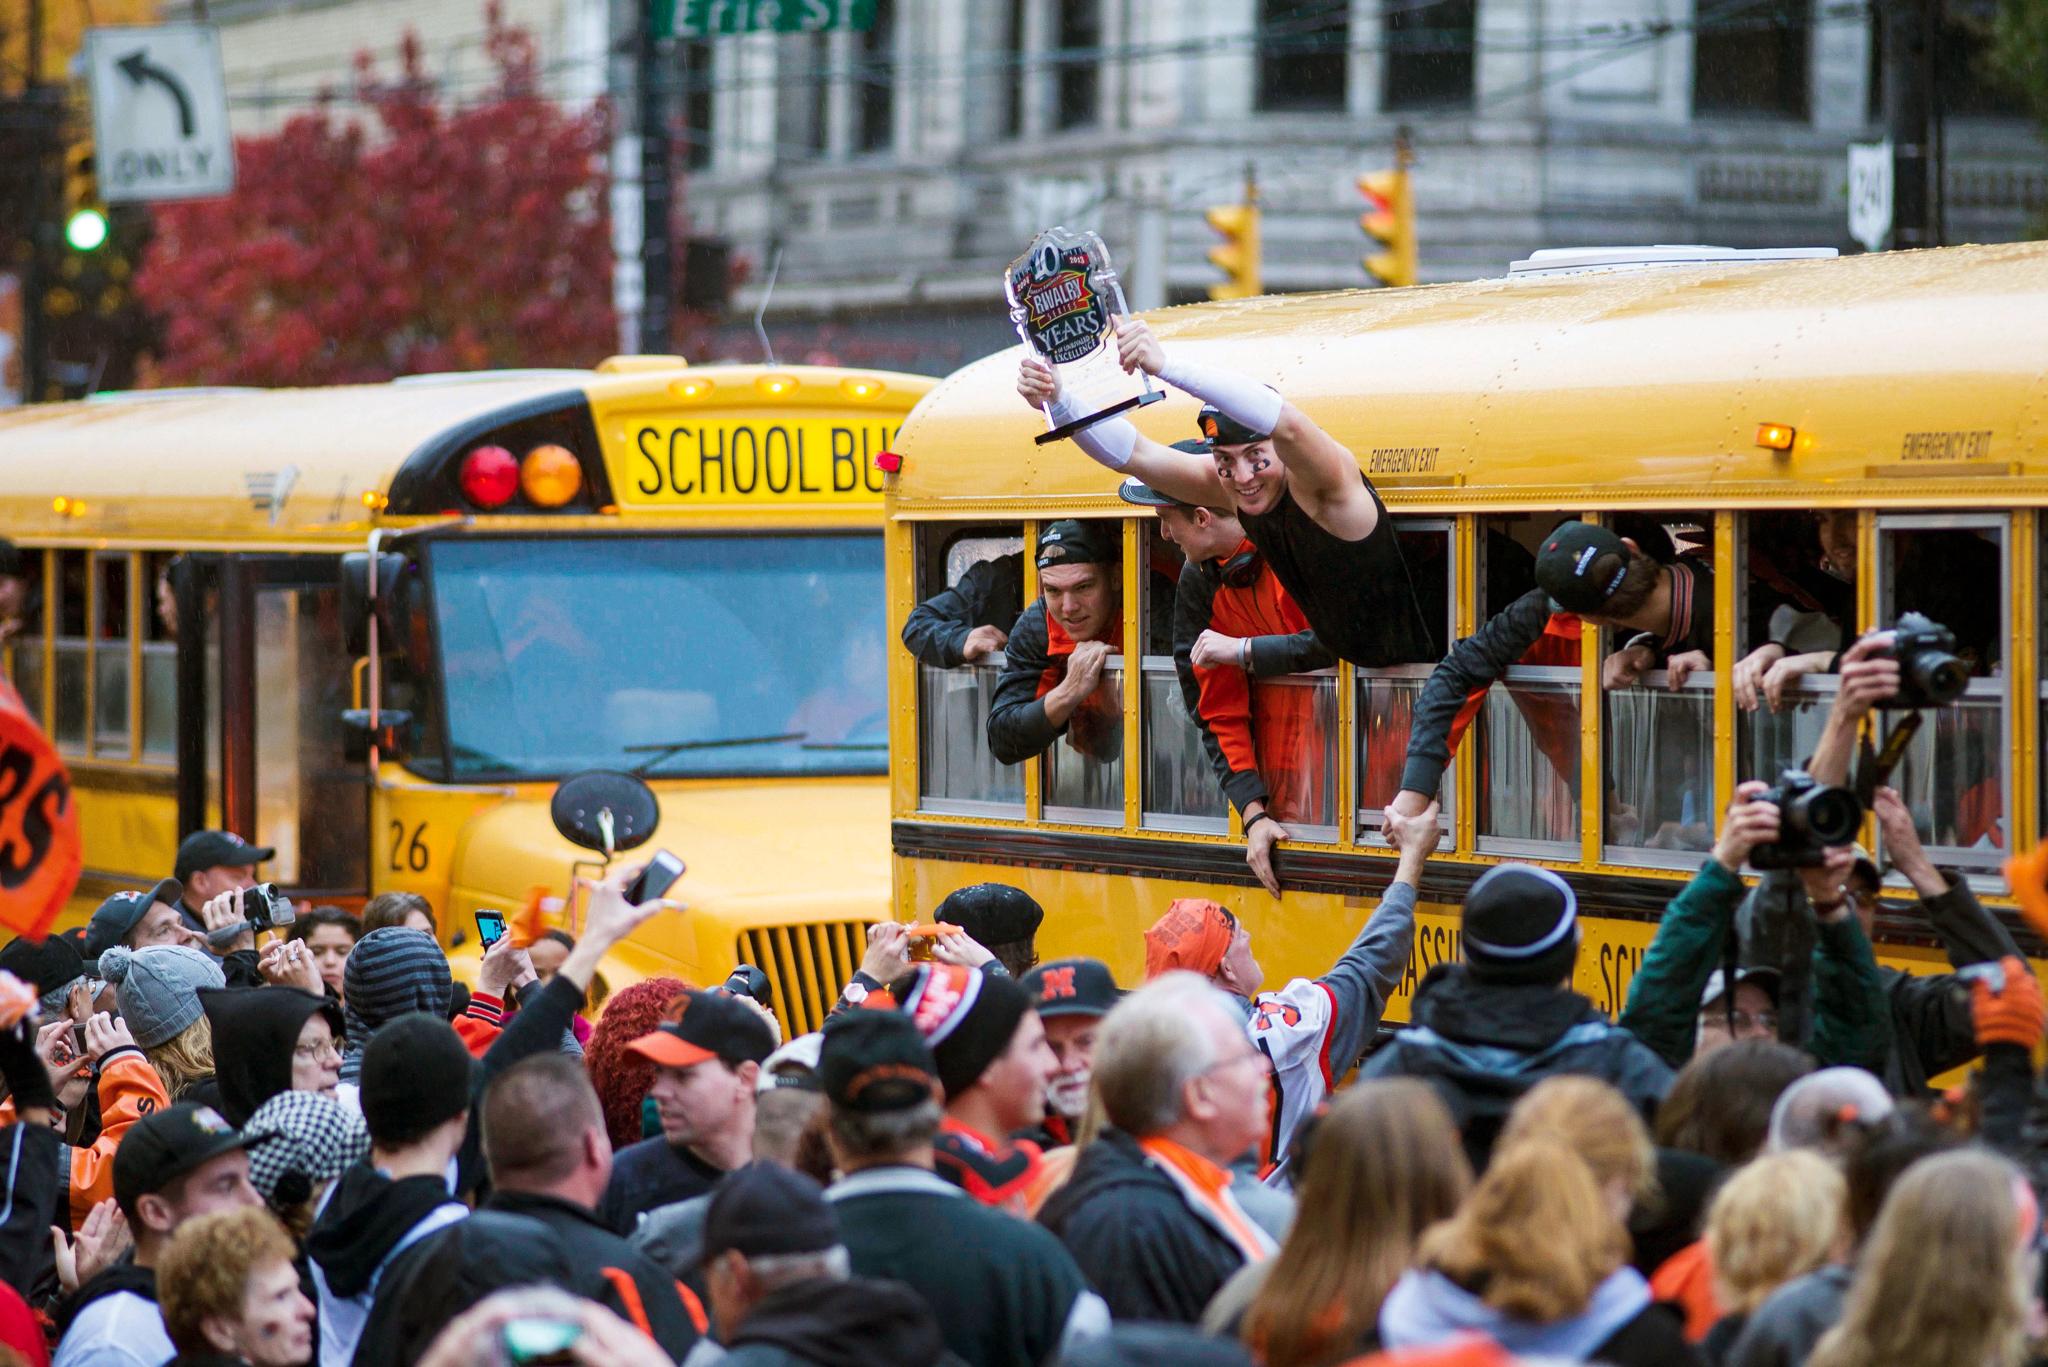 Gran multitud rodea dos autobuses con personas asomadas por las ventanas (© Jenna Watson/Tiger Legacy/Daylight Books)